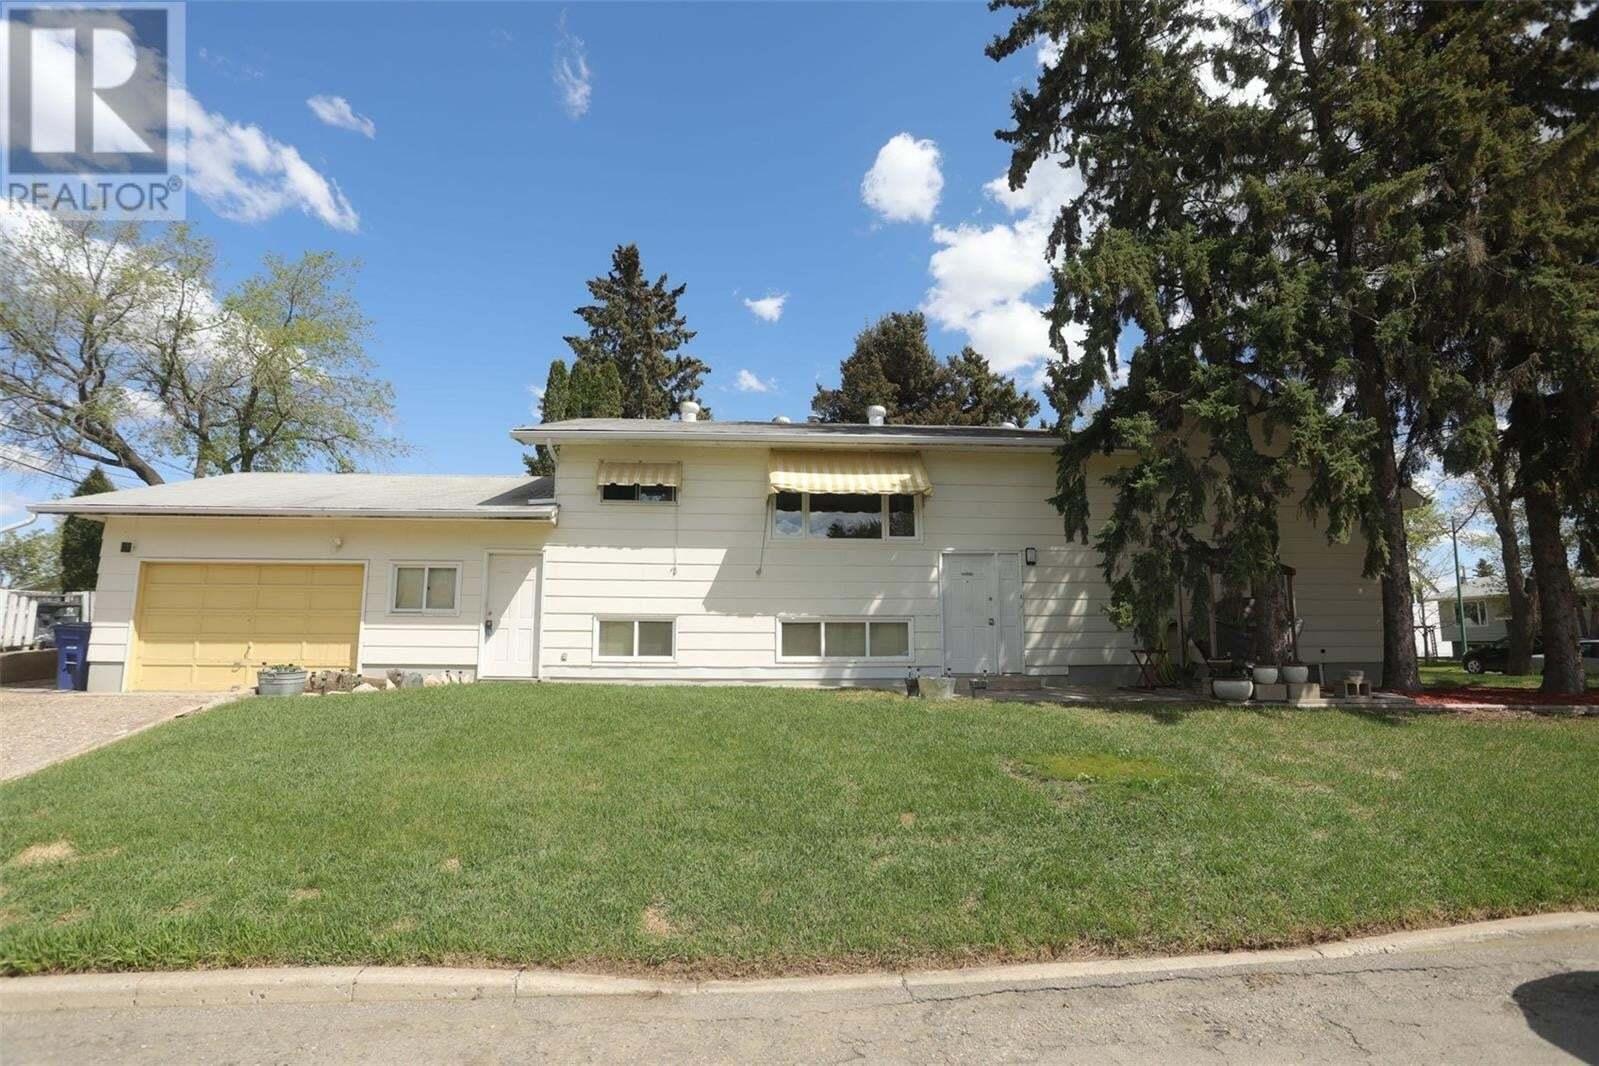 House for sale at 301 1st St E Saskatoon Saskatchewan - MLS: SK809766